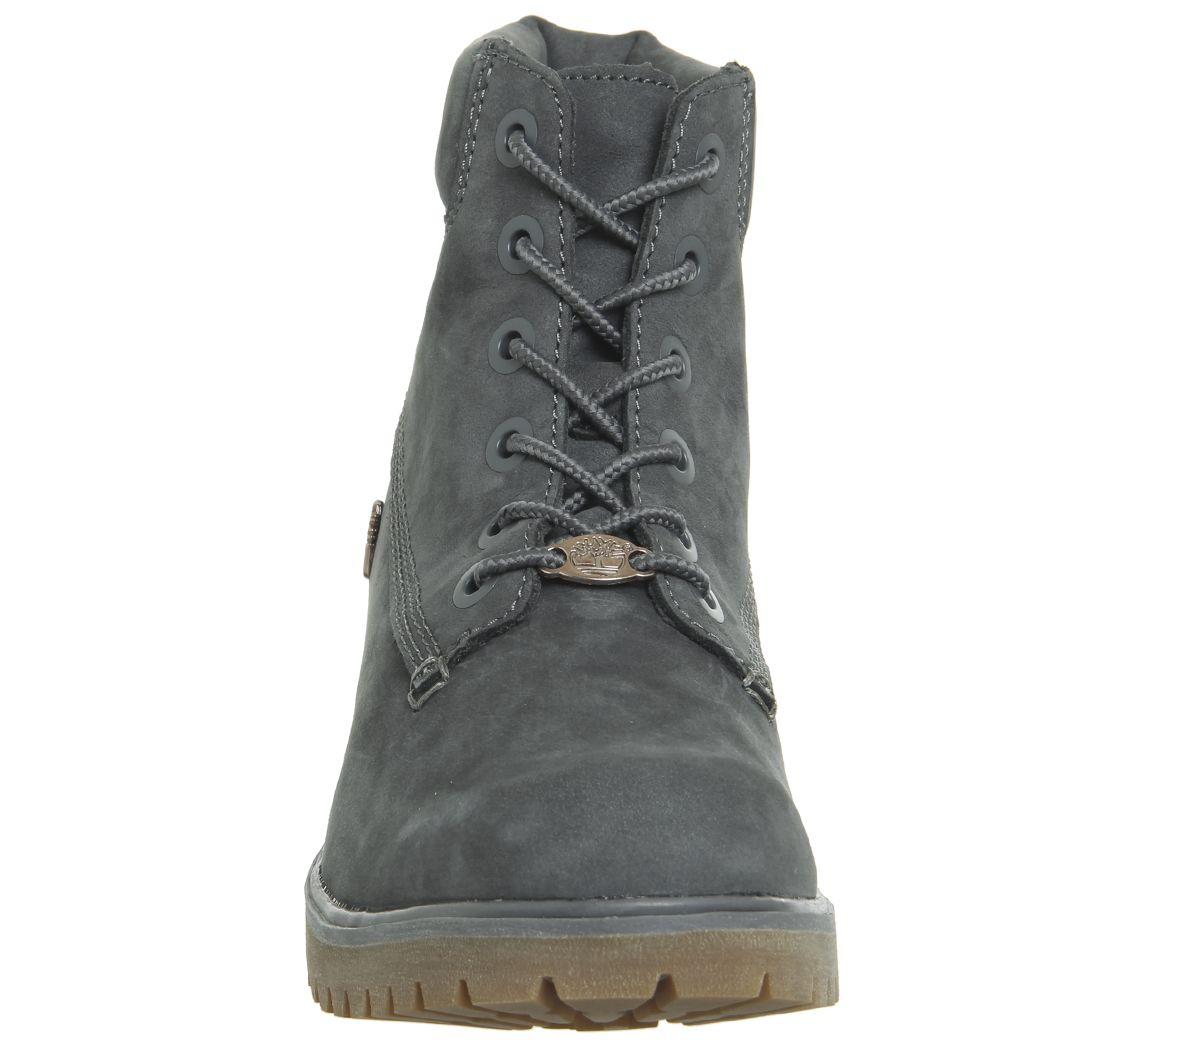 64bb0510c5c Womens Timberland Slim Premium 6 Inch Boots Forged Iron Nubuck Boots ...